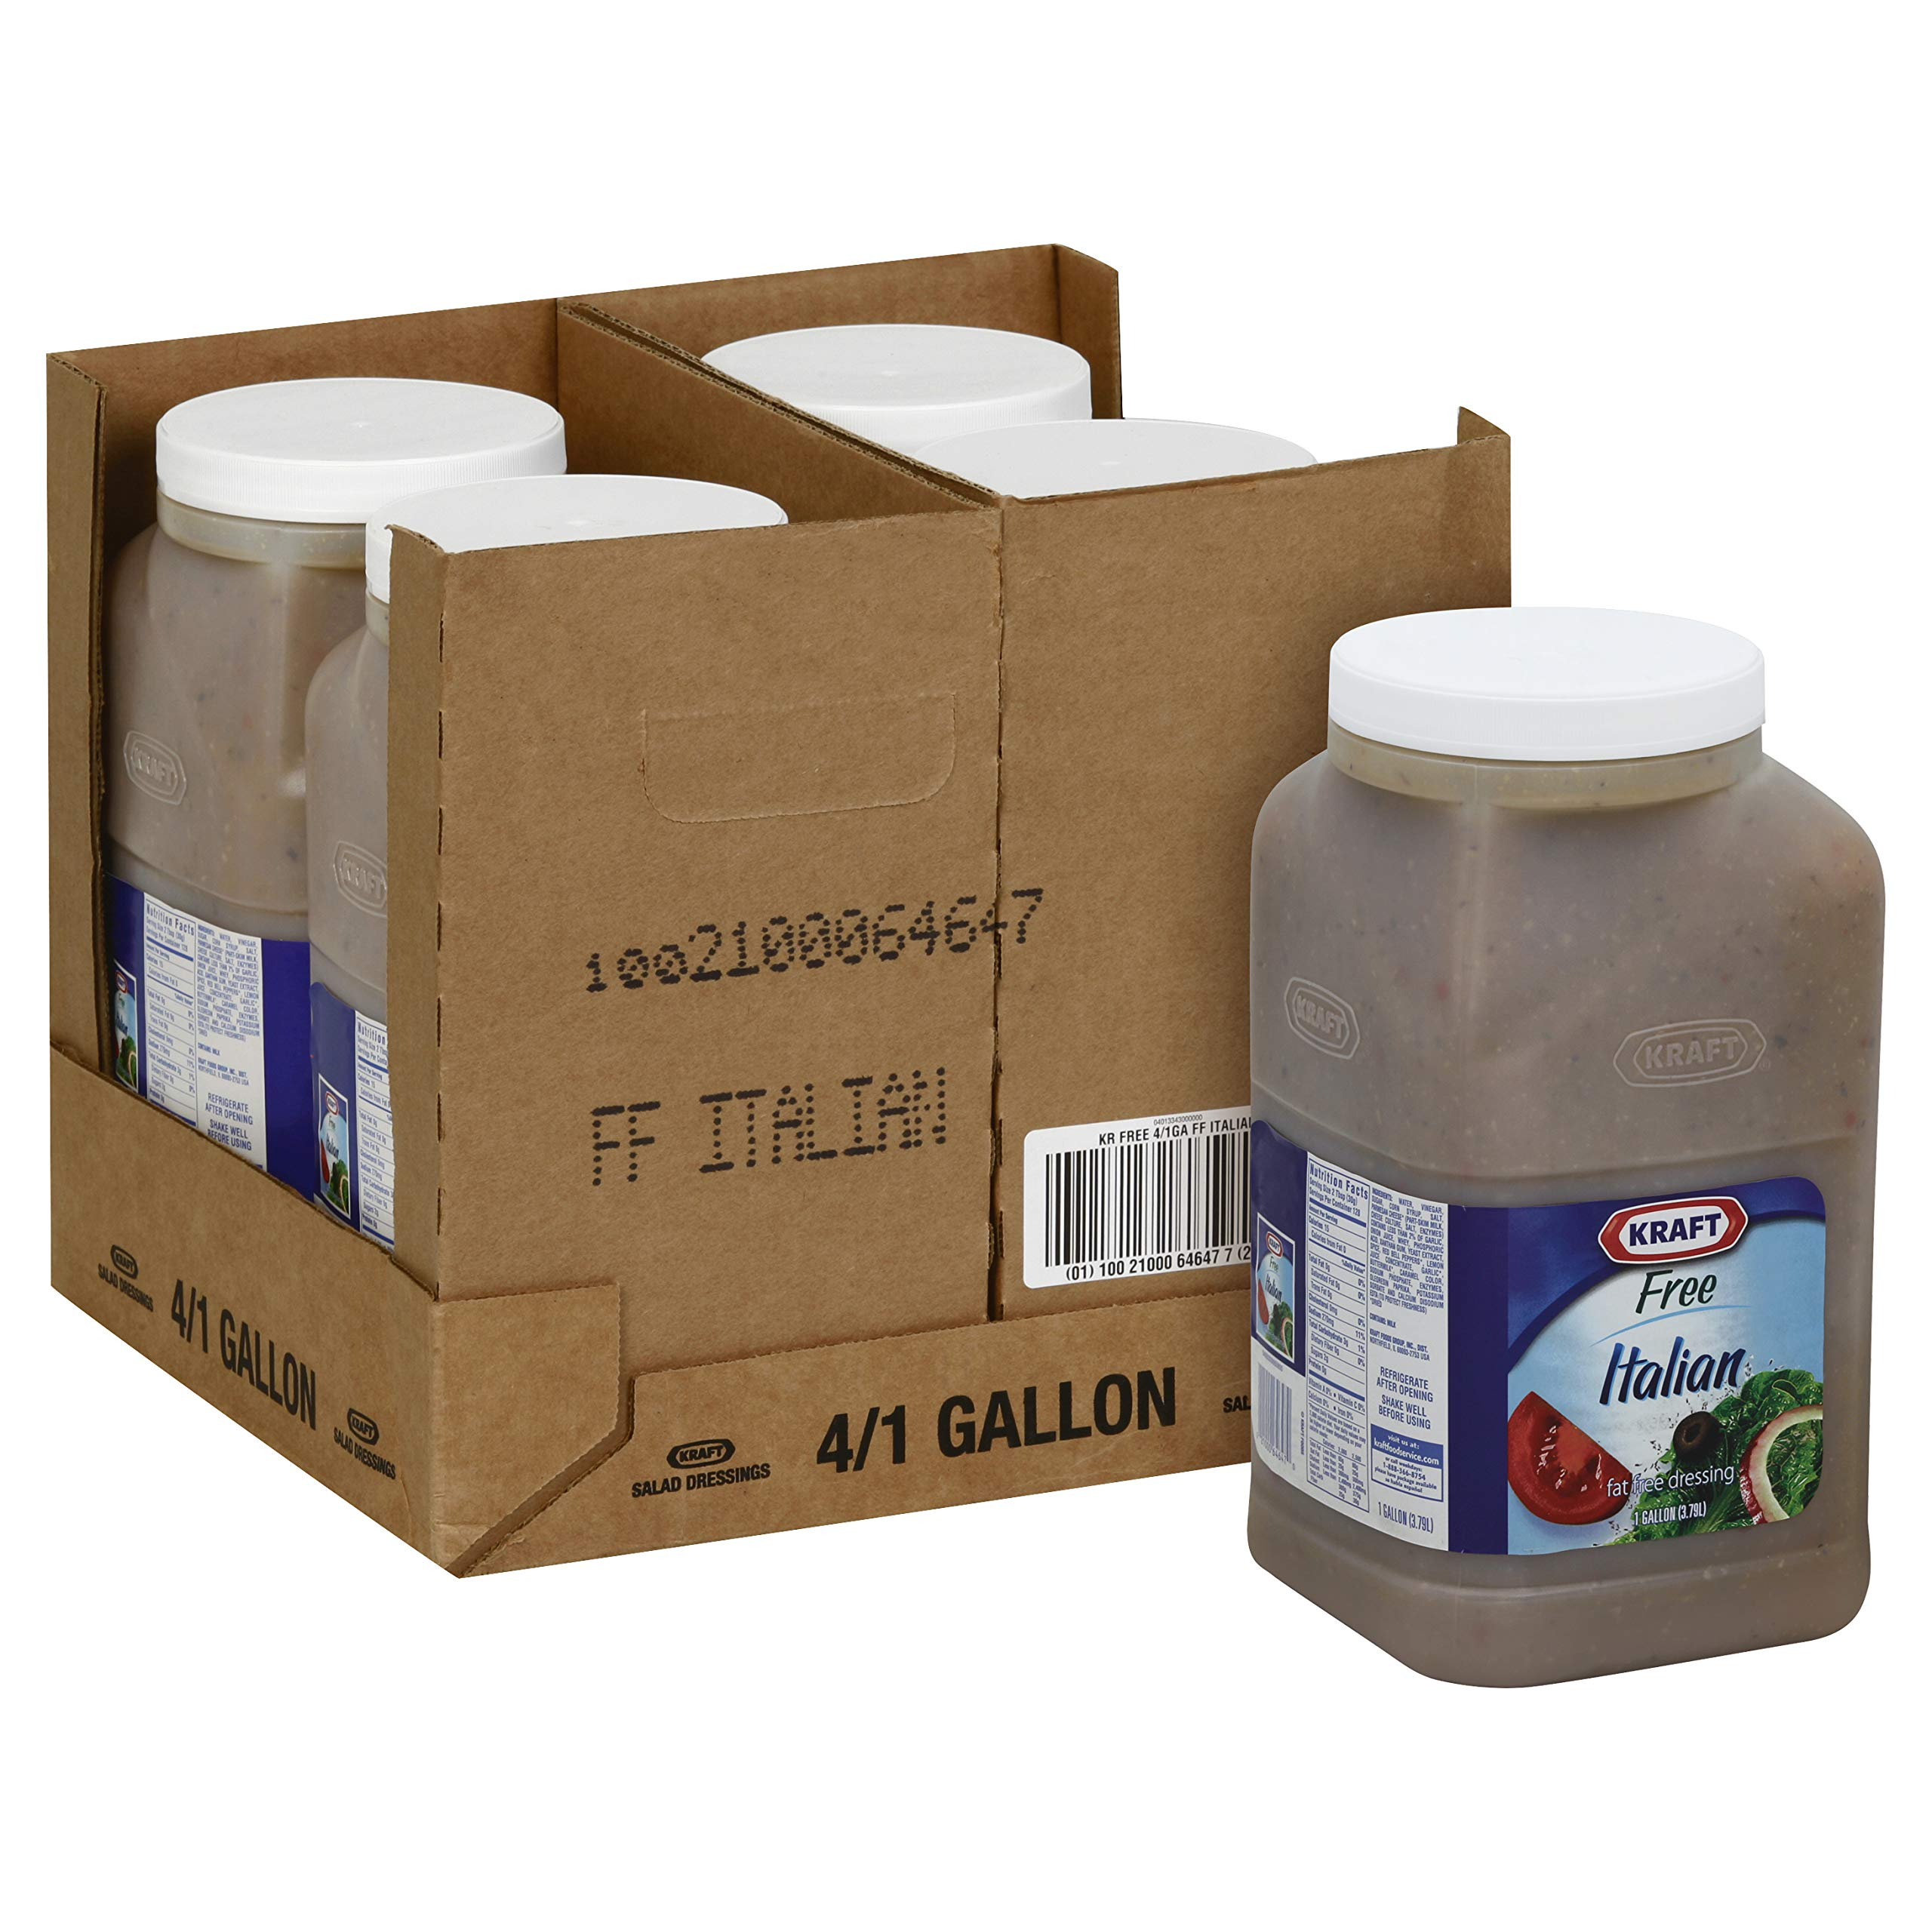 Dressing Kraft Free Italian 4 Case 1 Gallon by Kraft